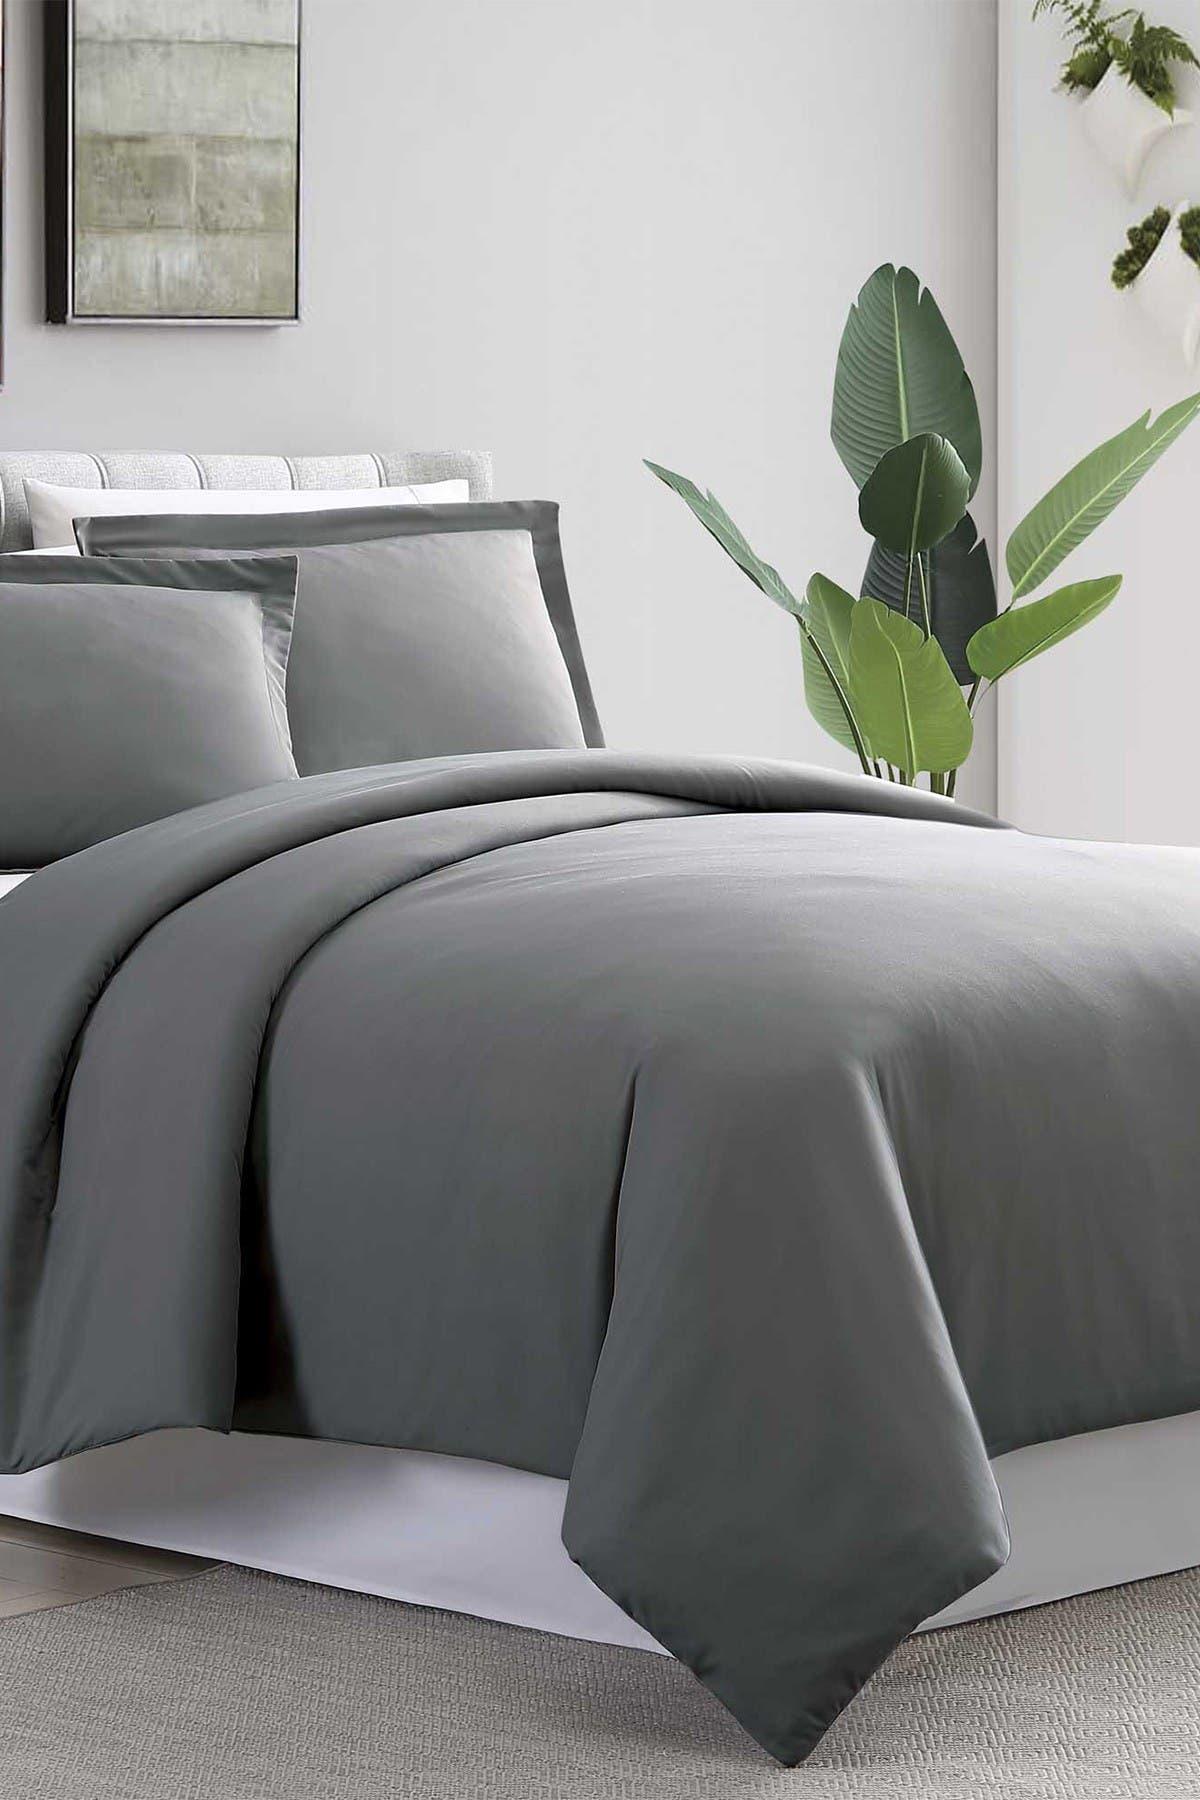 Image of Modern Threads Full/Queen  Ultra Plush Duvet Set - Charcoal